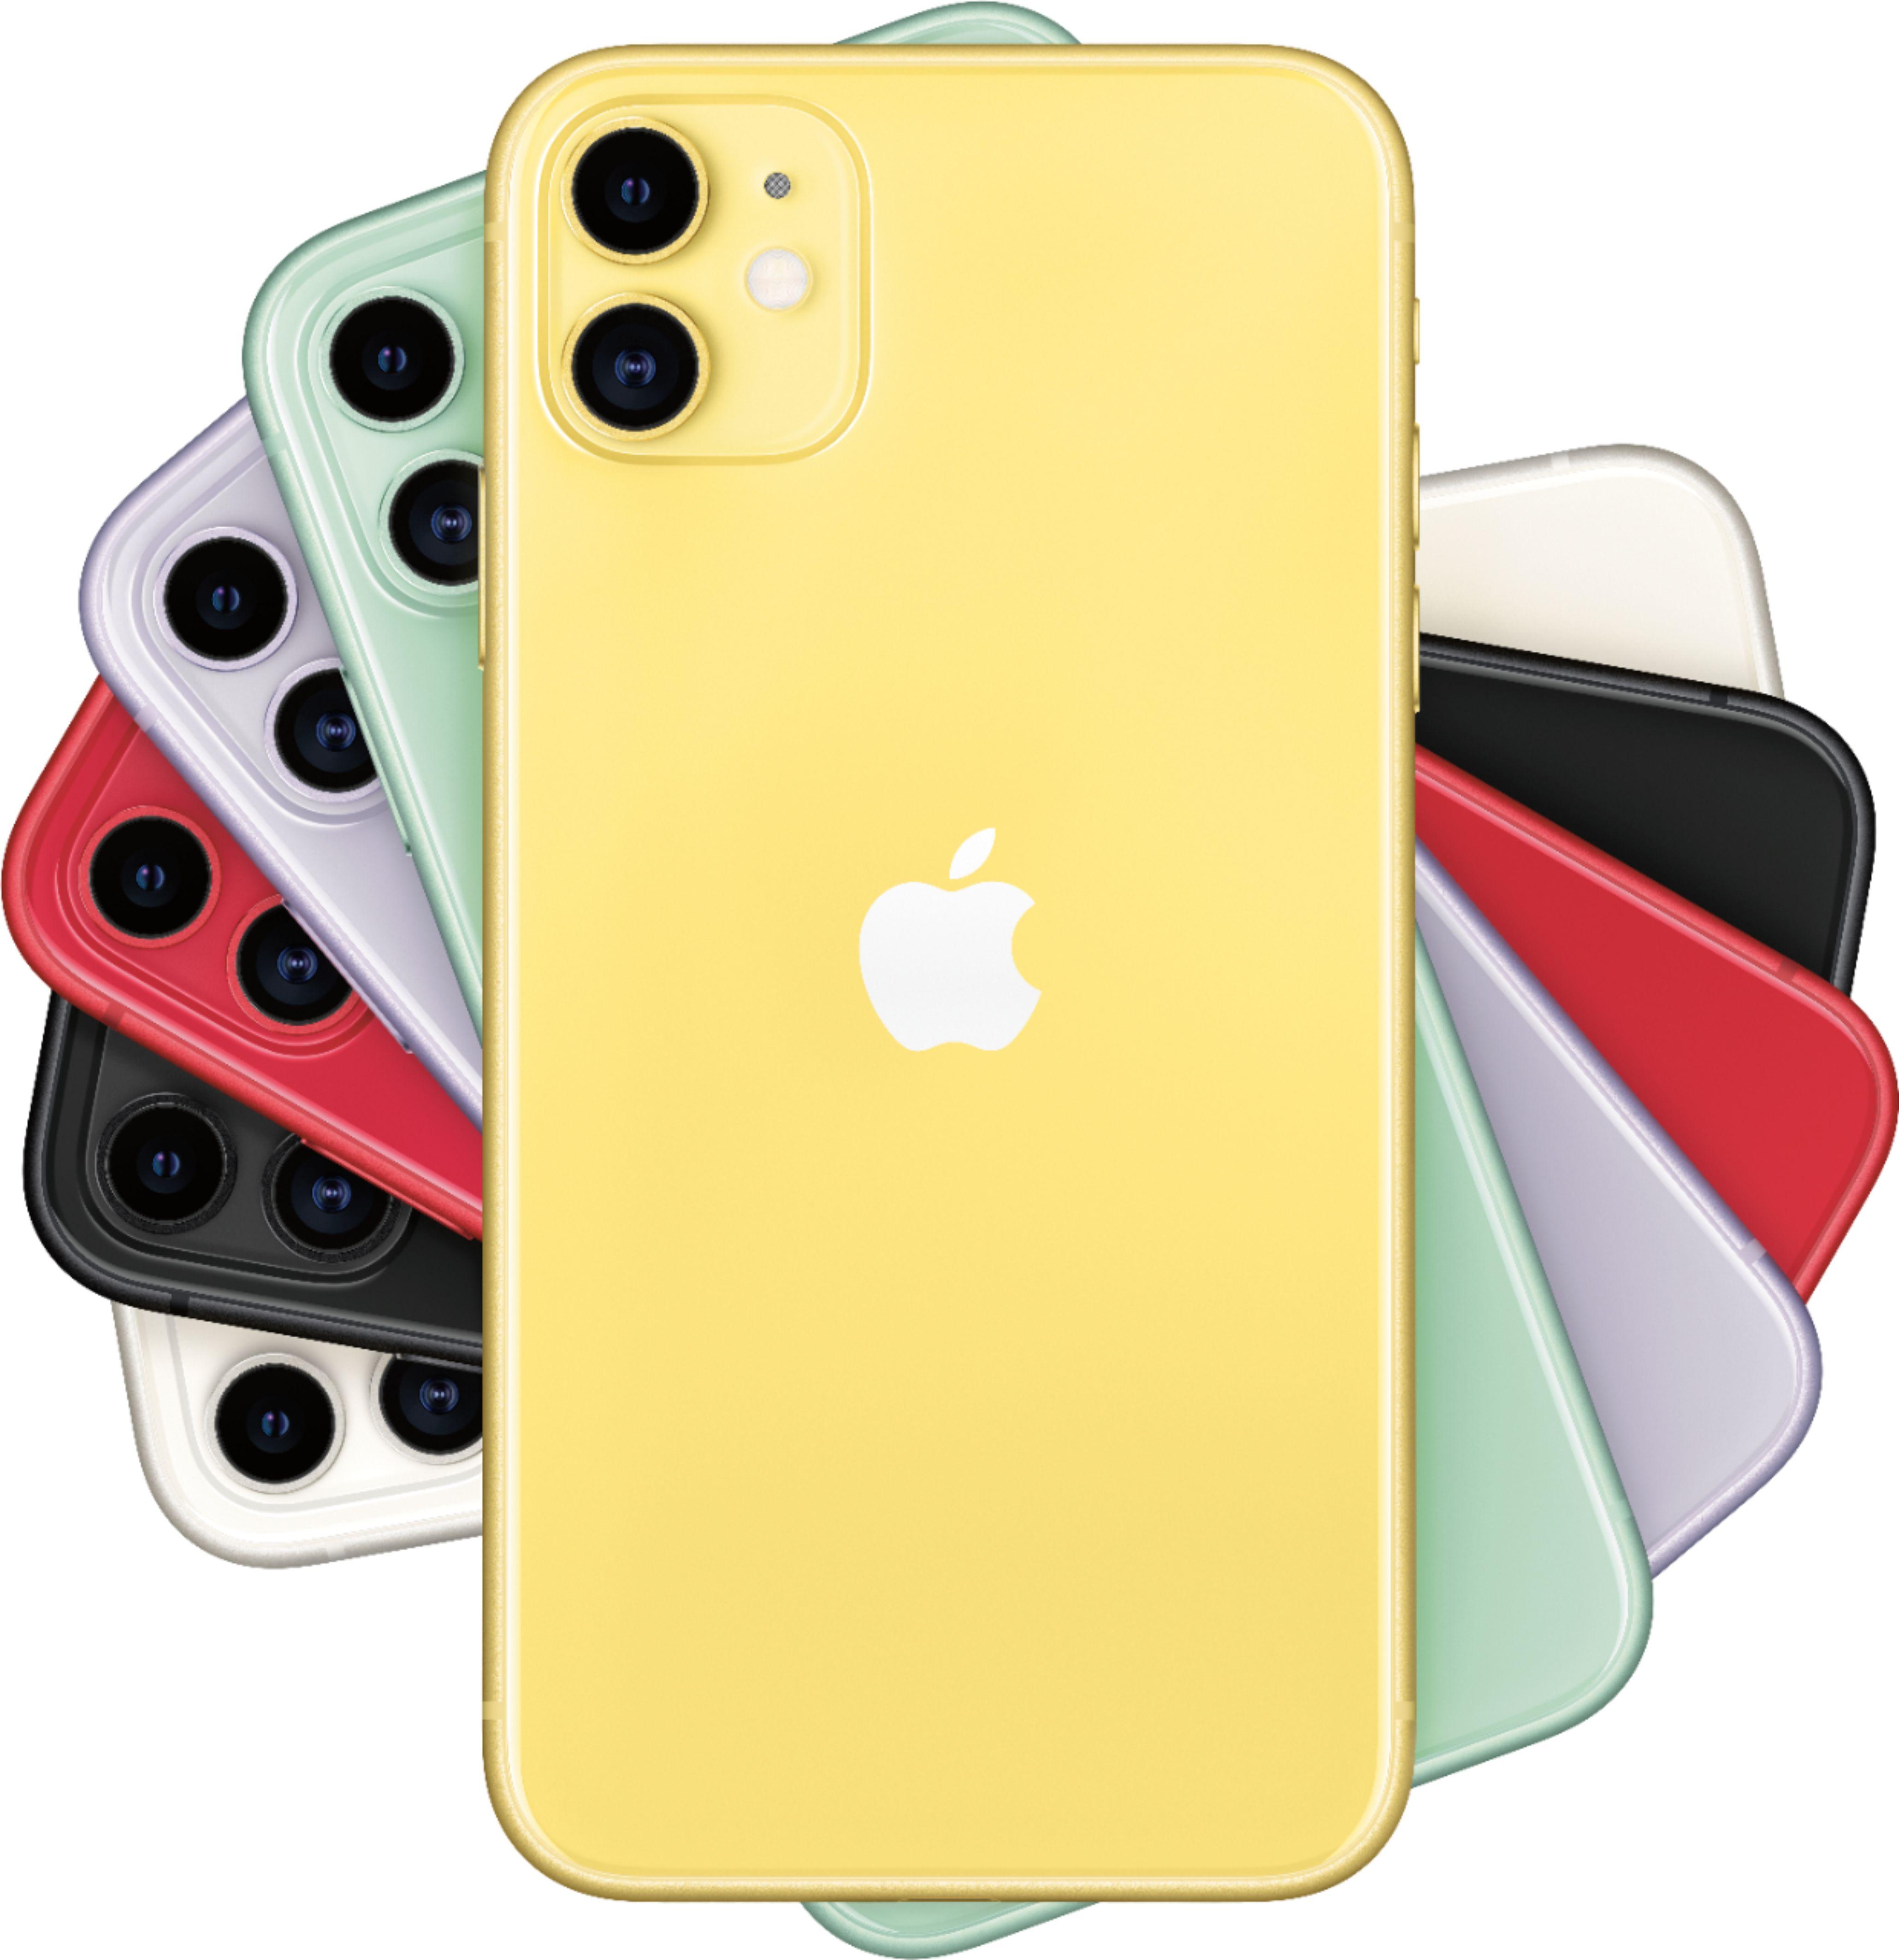 Apple iPhone 11 64GB Yellow (Verizon) MWLA2LL/A - Best Buy